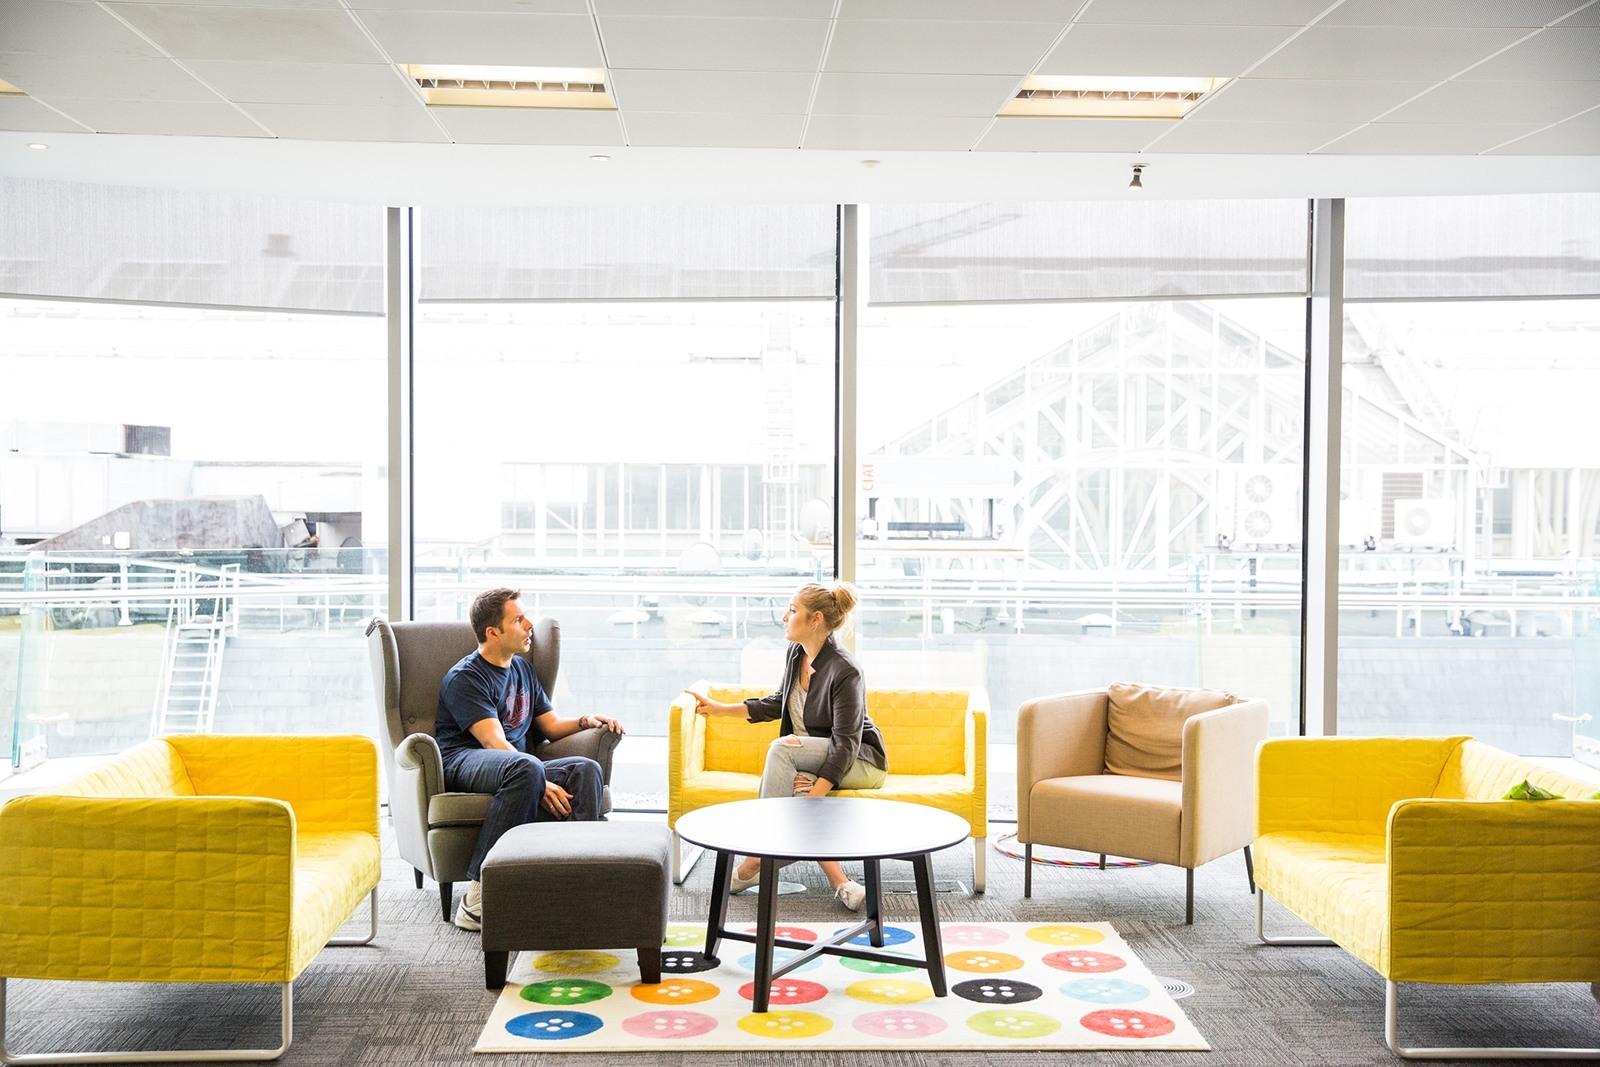 A Tour of Qualtrics' New Dublin Office